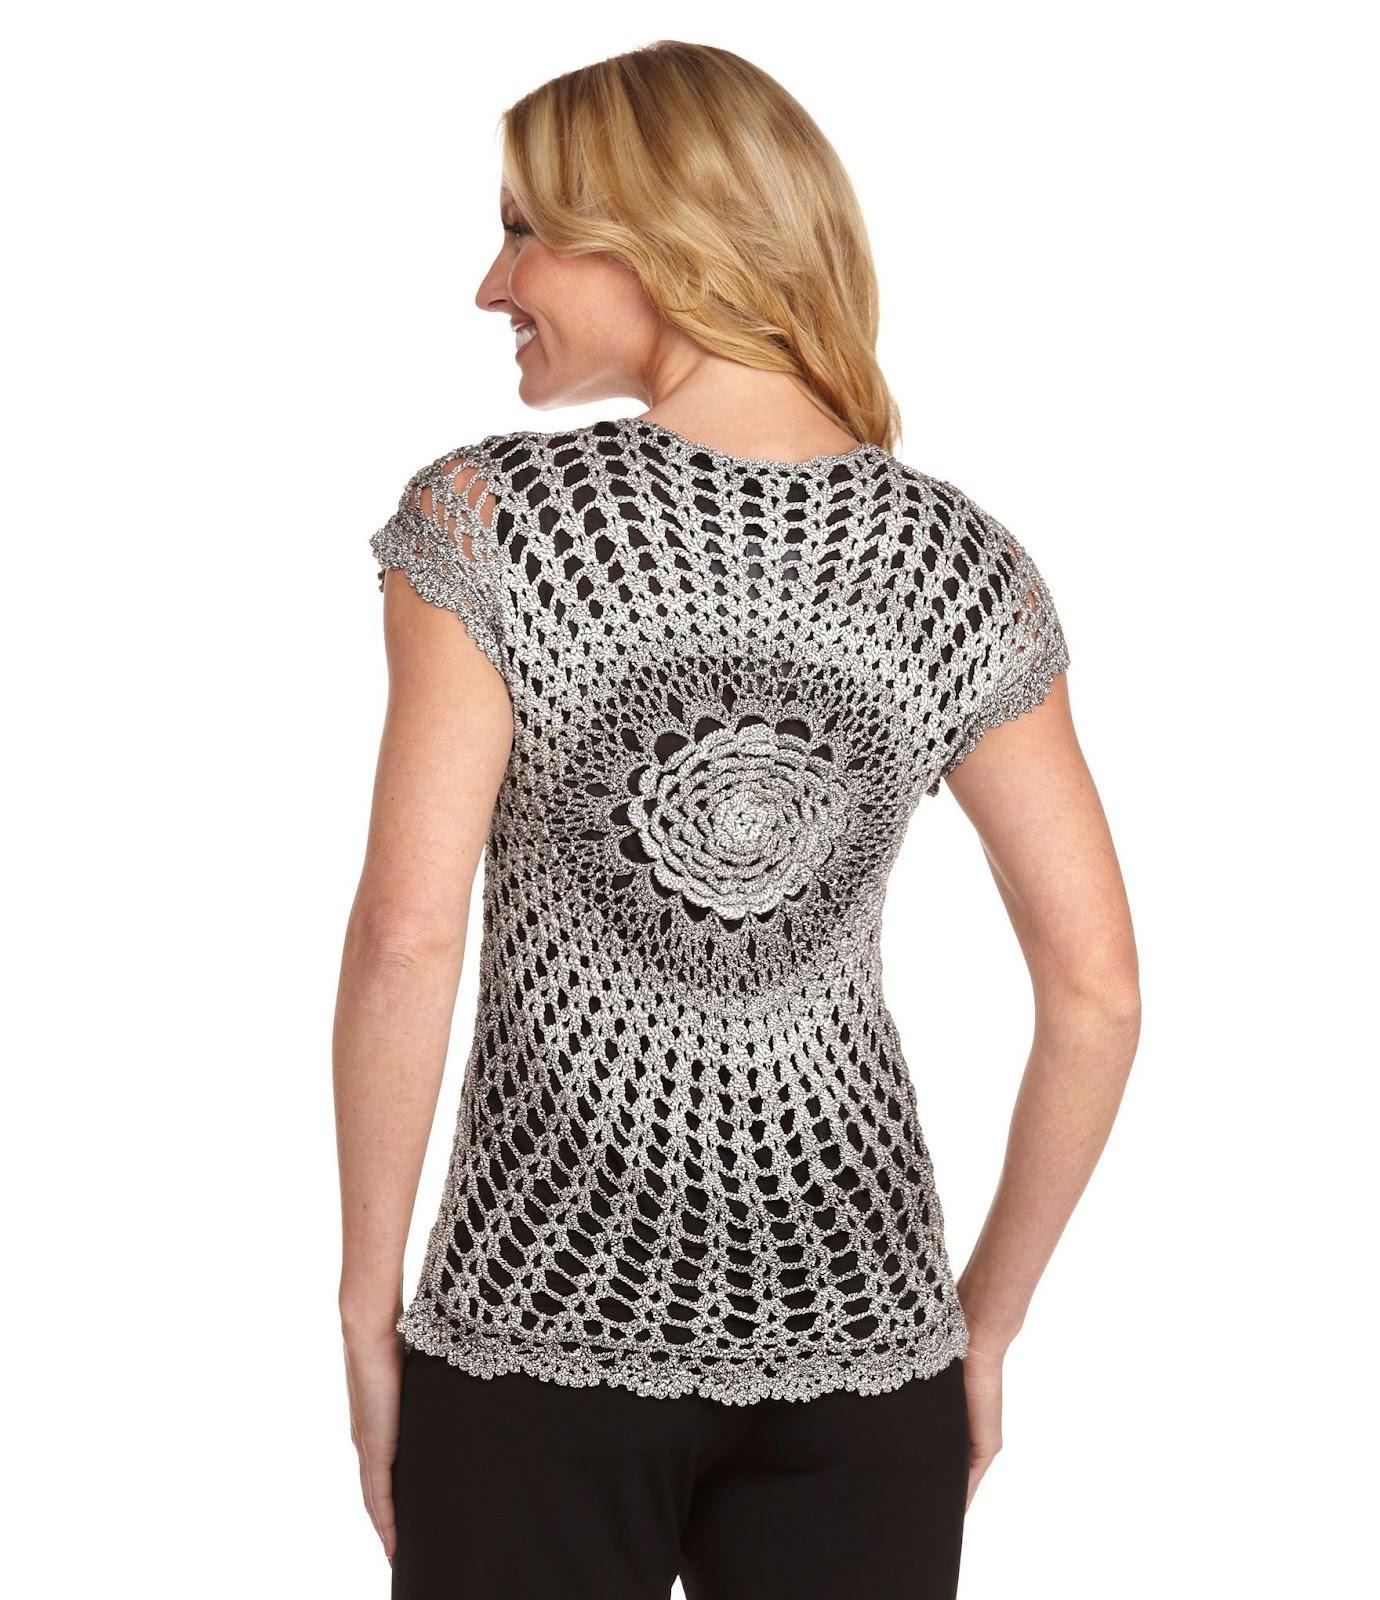 http://2.bp.blogspot.com/-d2Y05nk_3sA/T3GYbdkglaI/AAAAAAAACso/lMCyjWXlZ40/s1600/crochetemodabcinza1.jpg